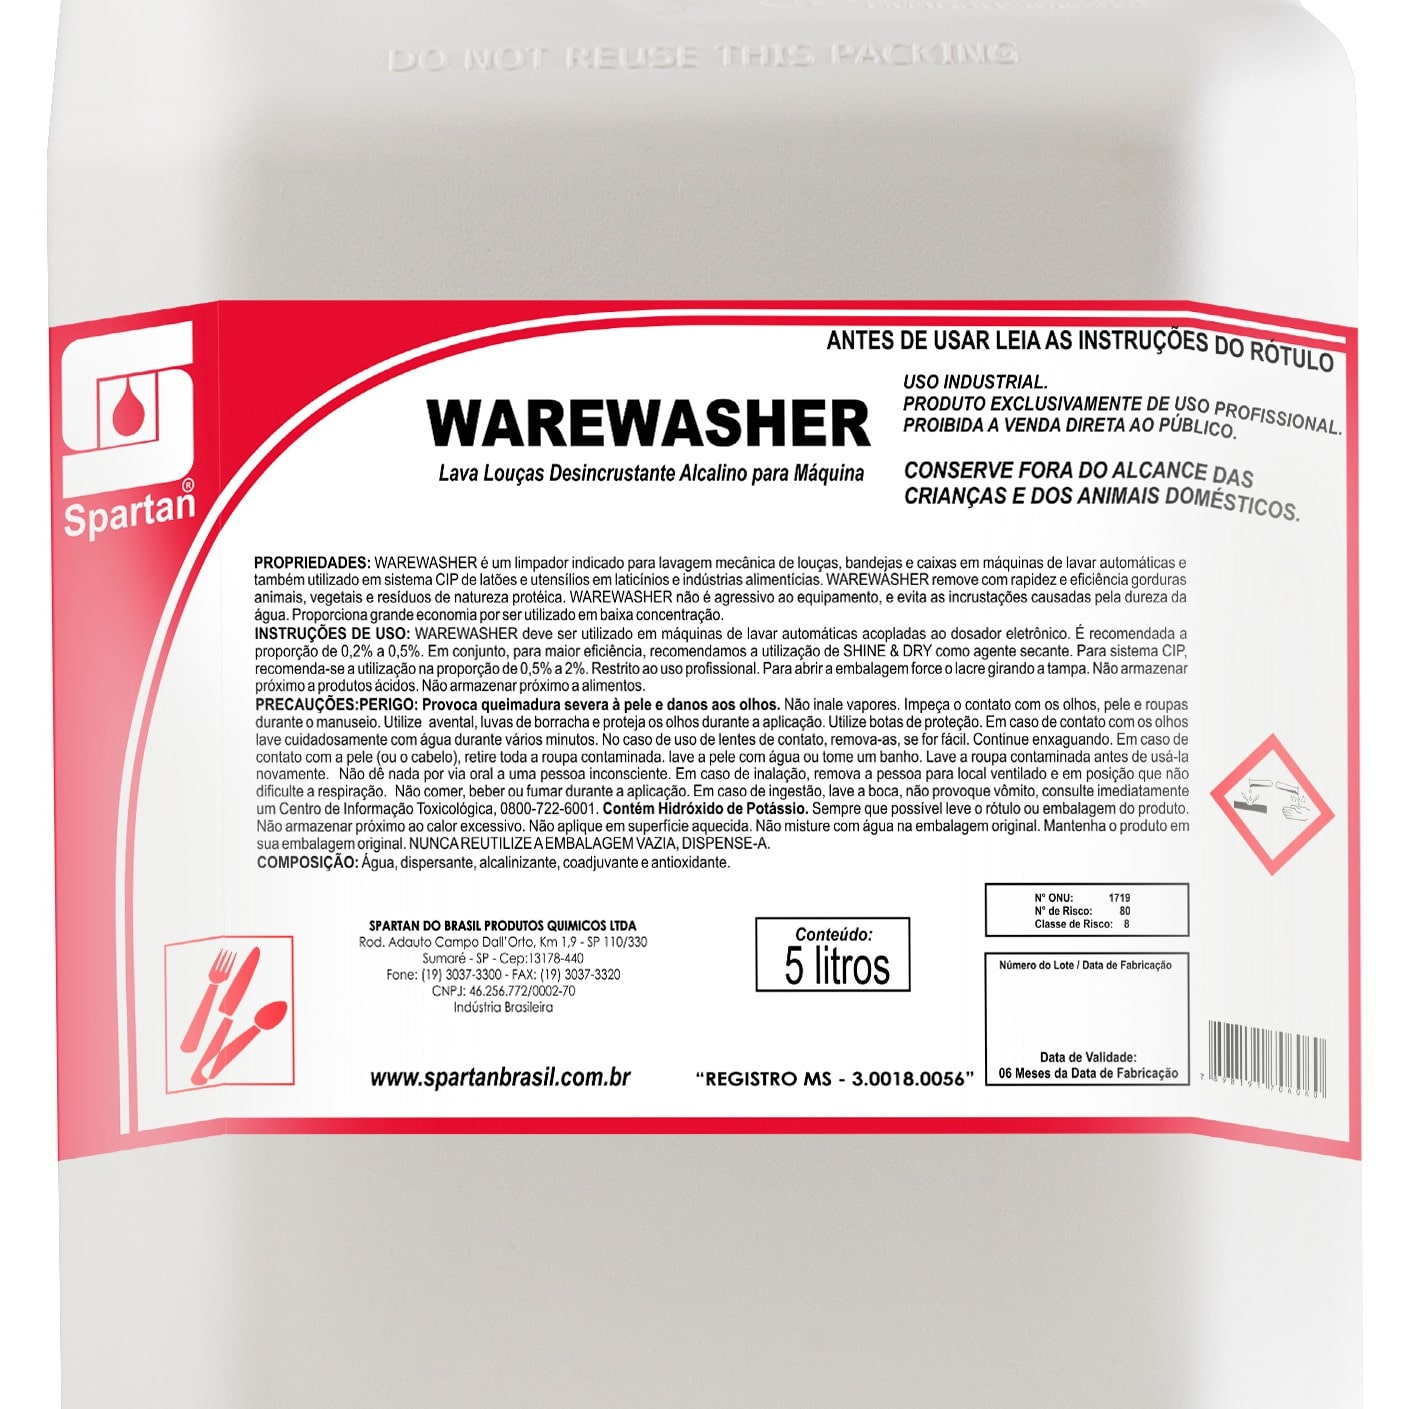 Warewasher lava louças 5 Litros Spartan  - Higinet